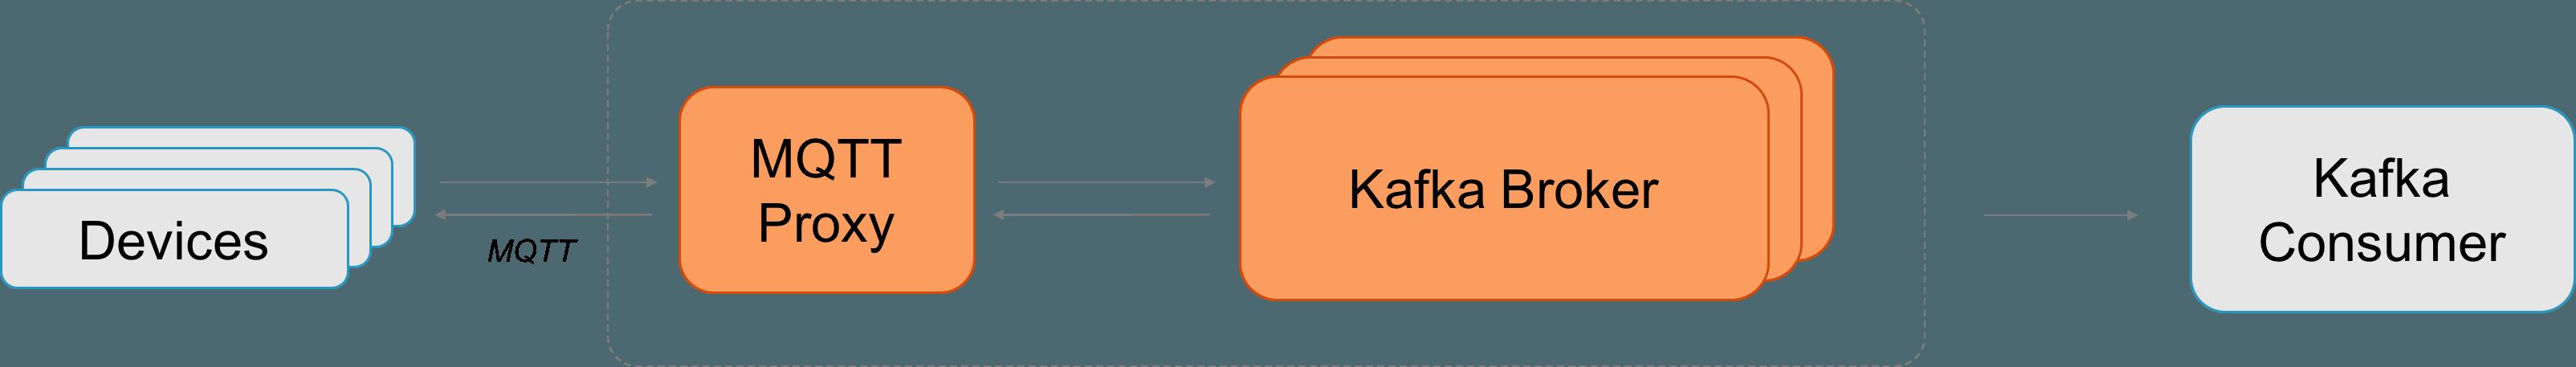 Apache Kafka & MQTT = End-to-End IoT Integration (Github